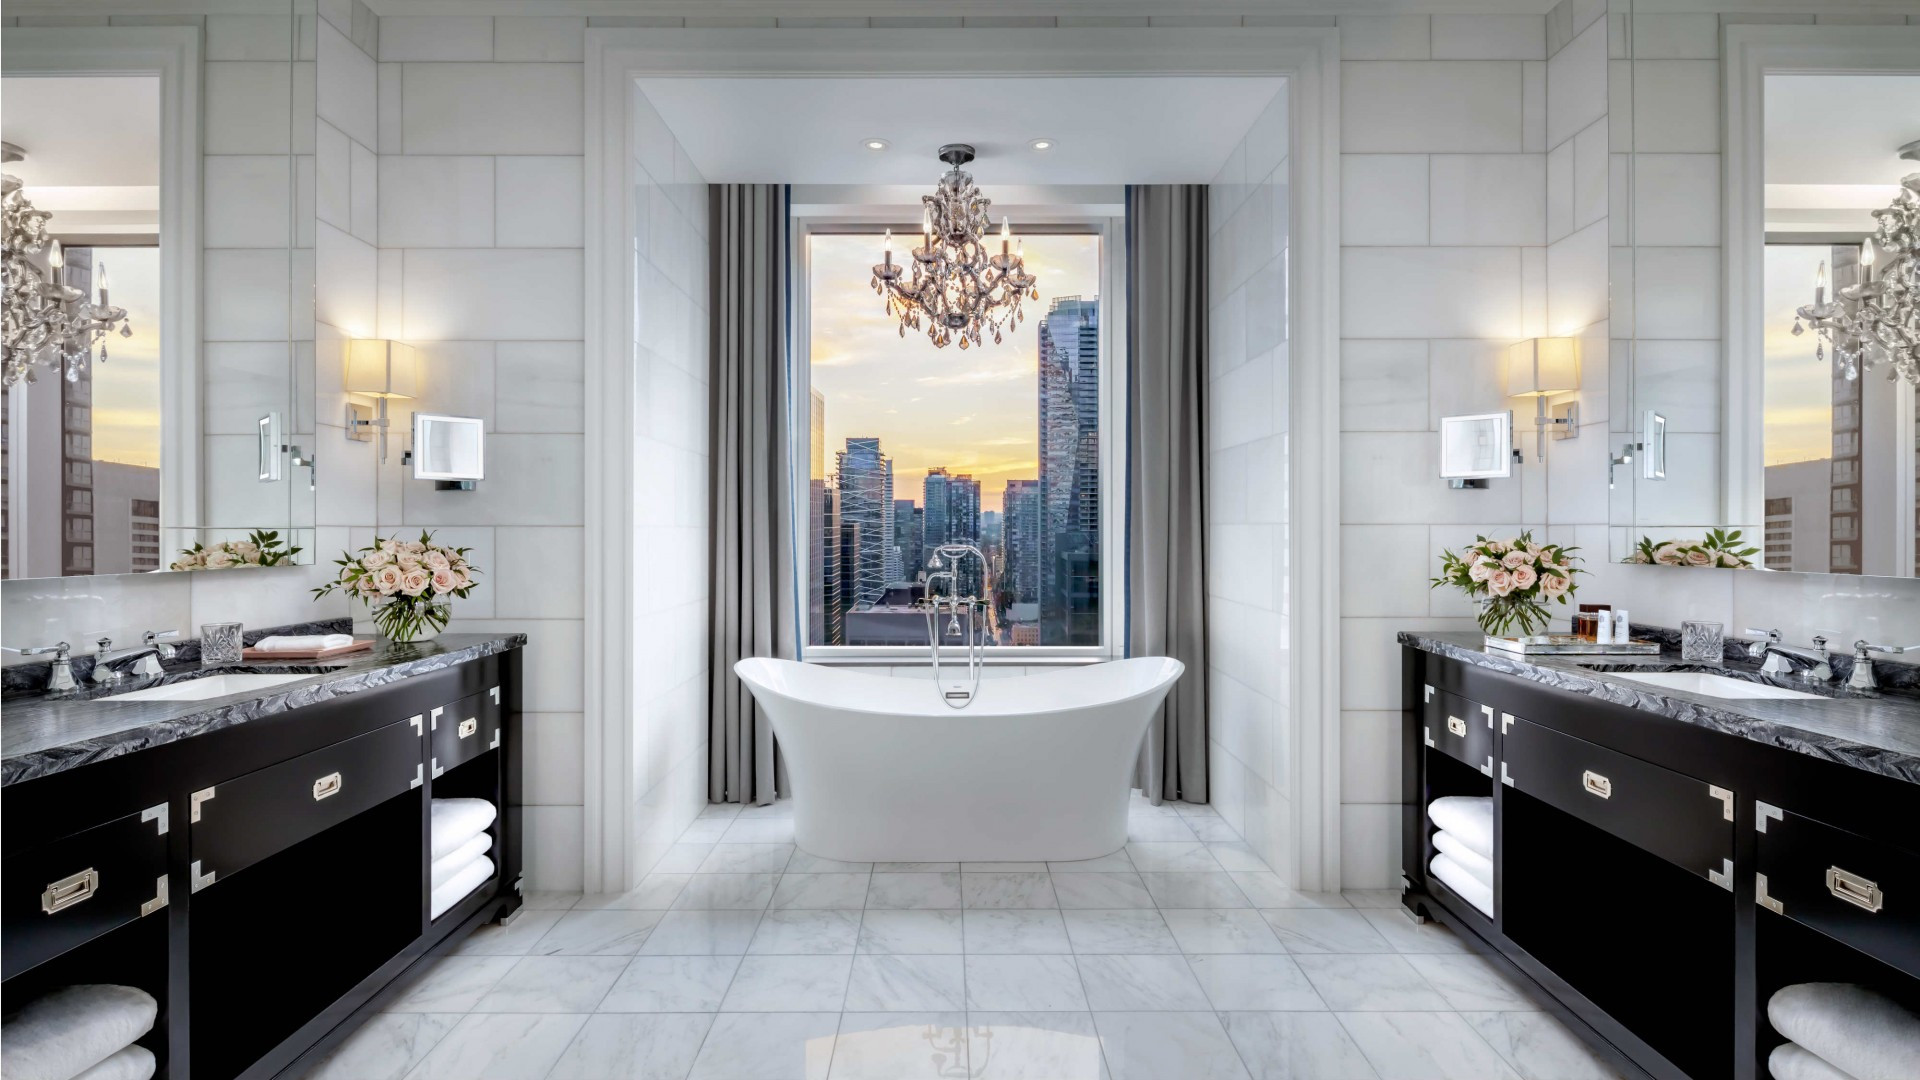 Best hotels Toronto staycation | The St. Regis Hotel ensuite bathroom